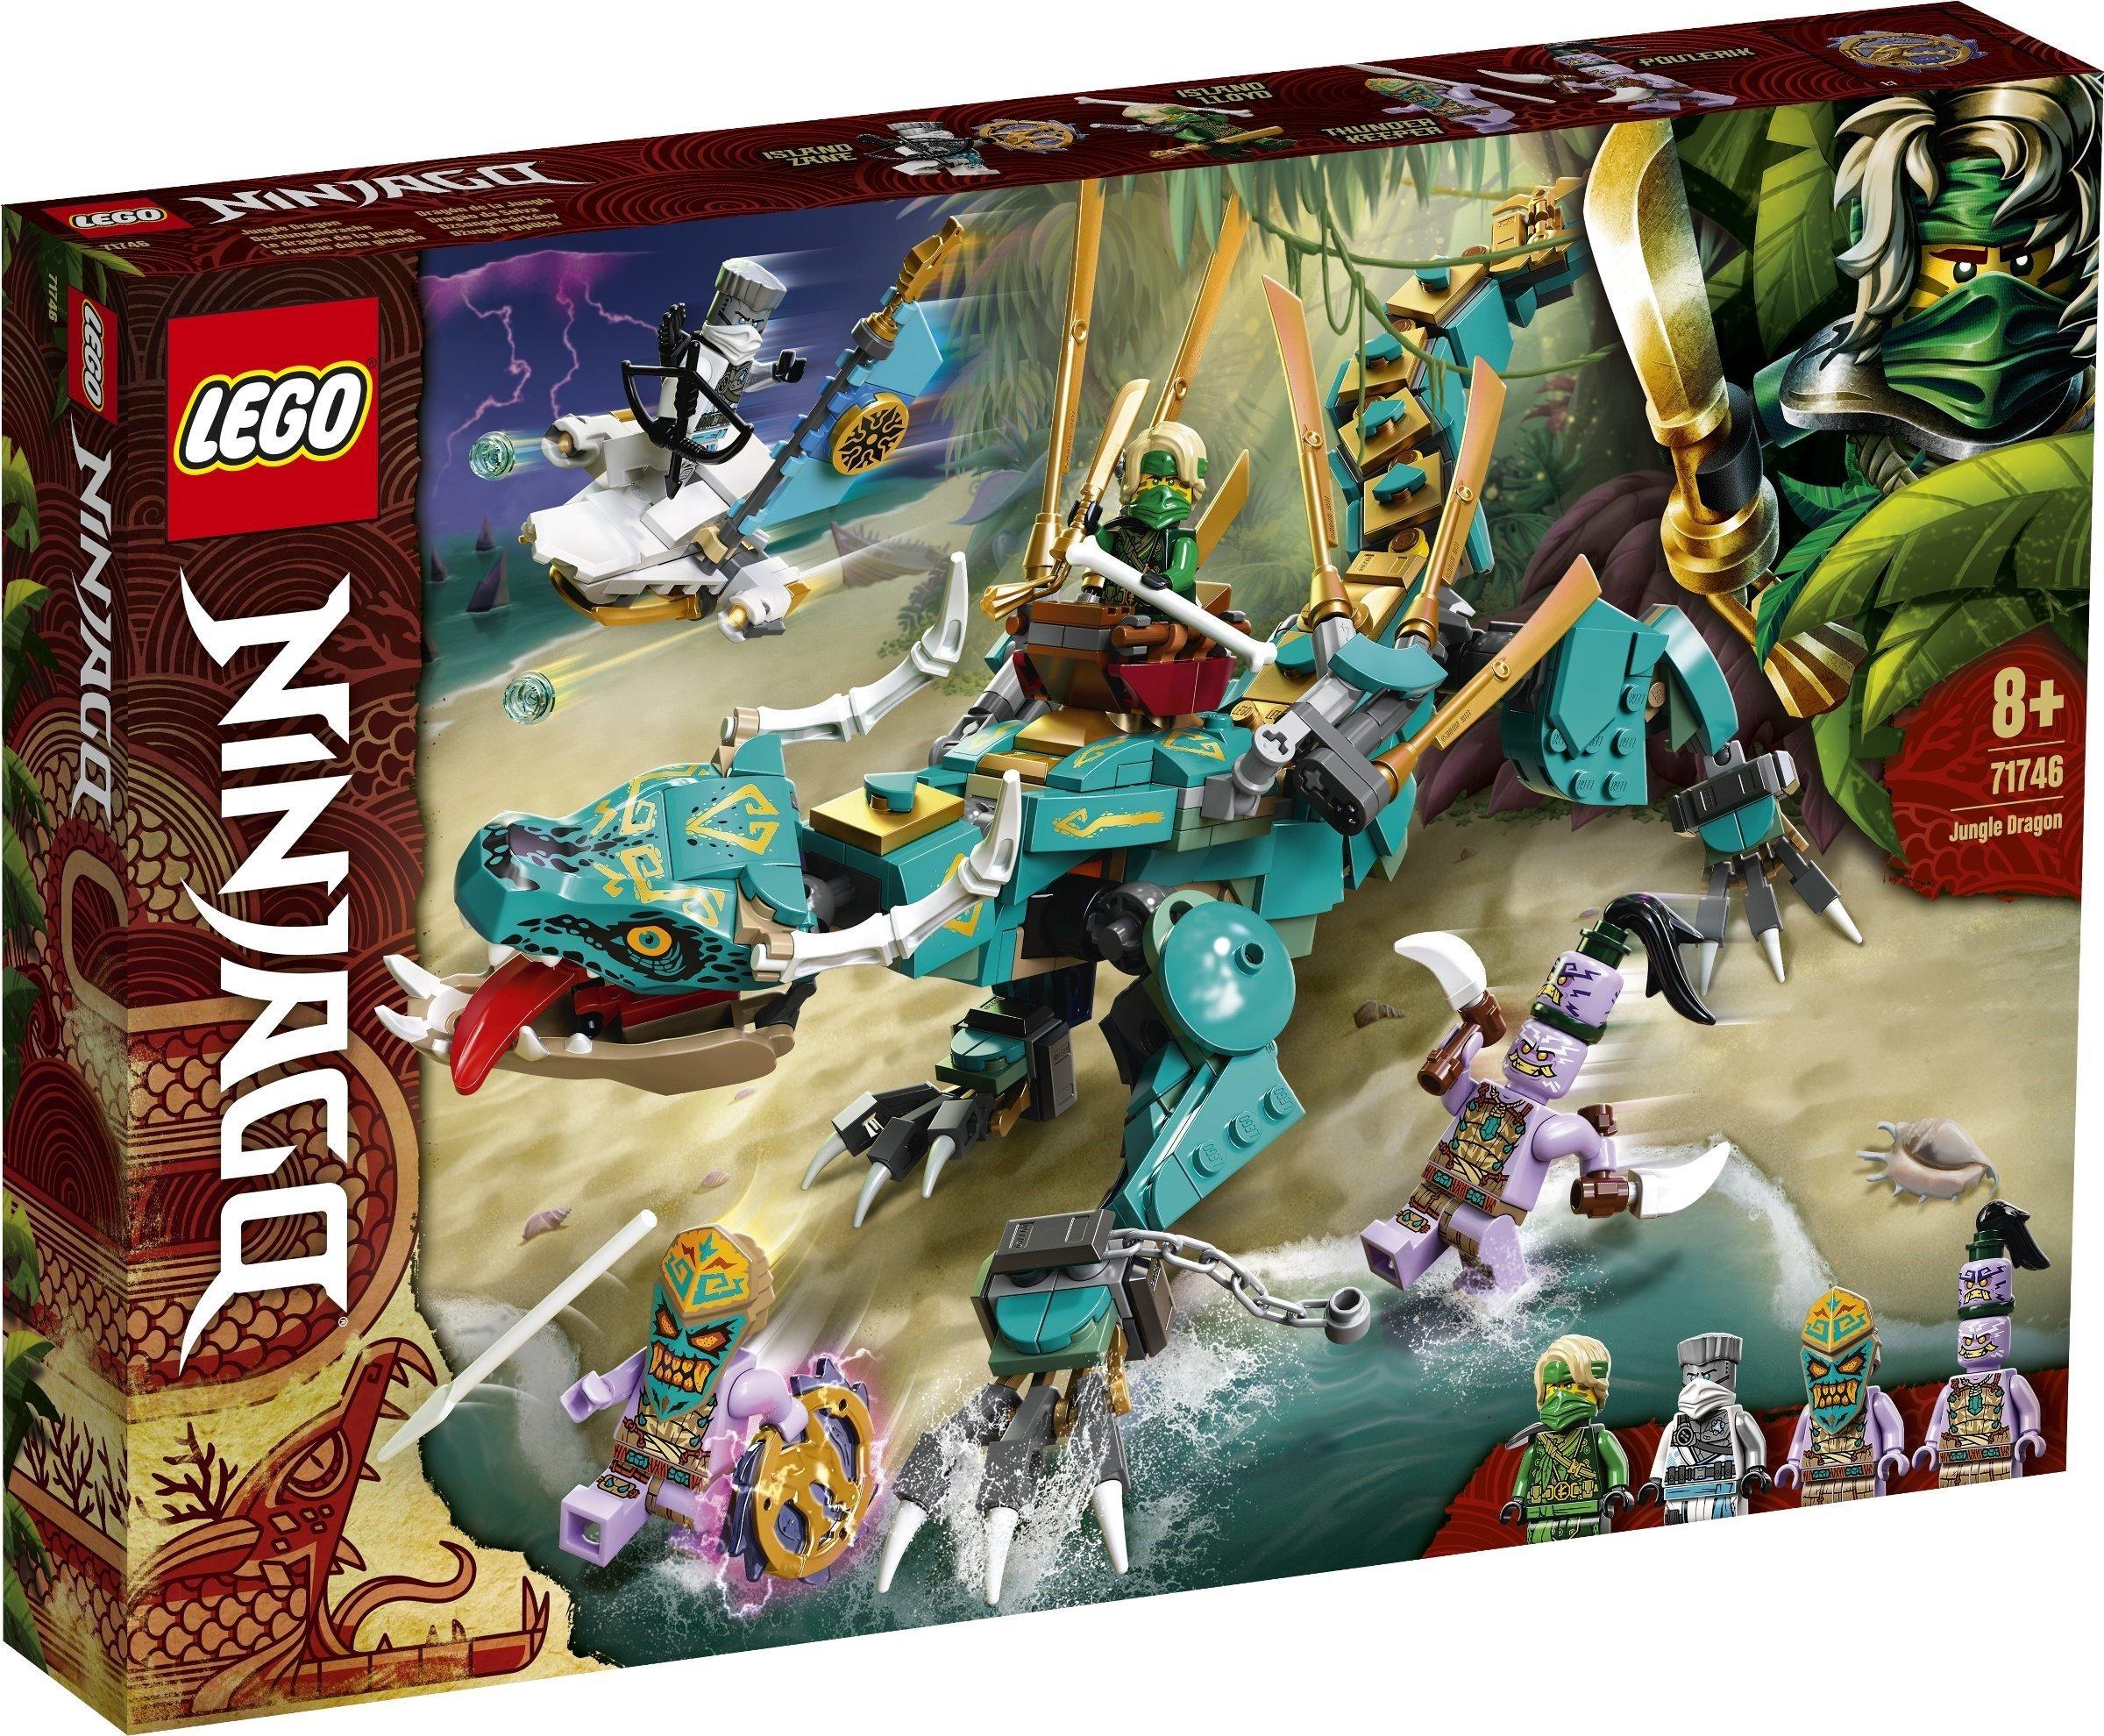 LEGO Ninjago - Jungle Dragon (71746)